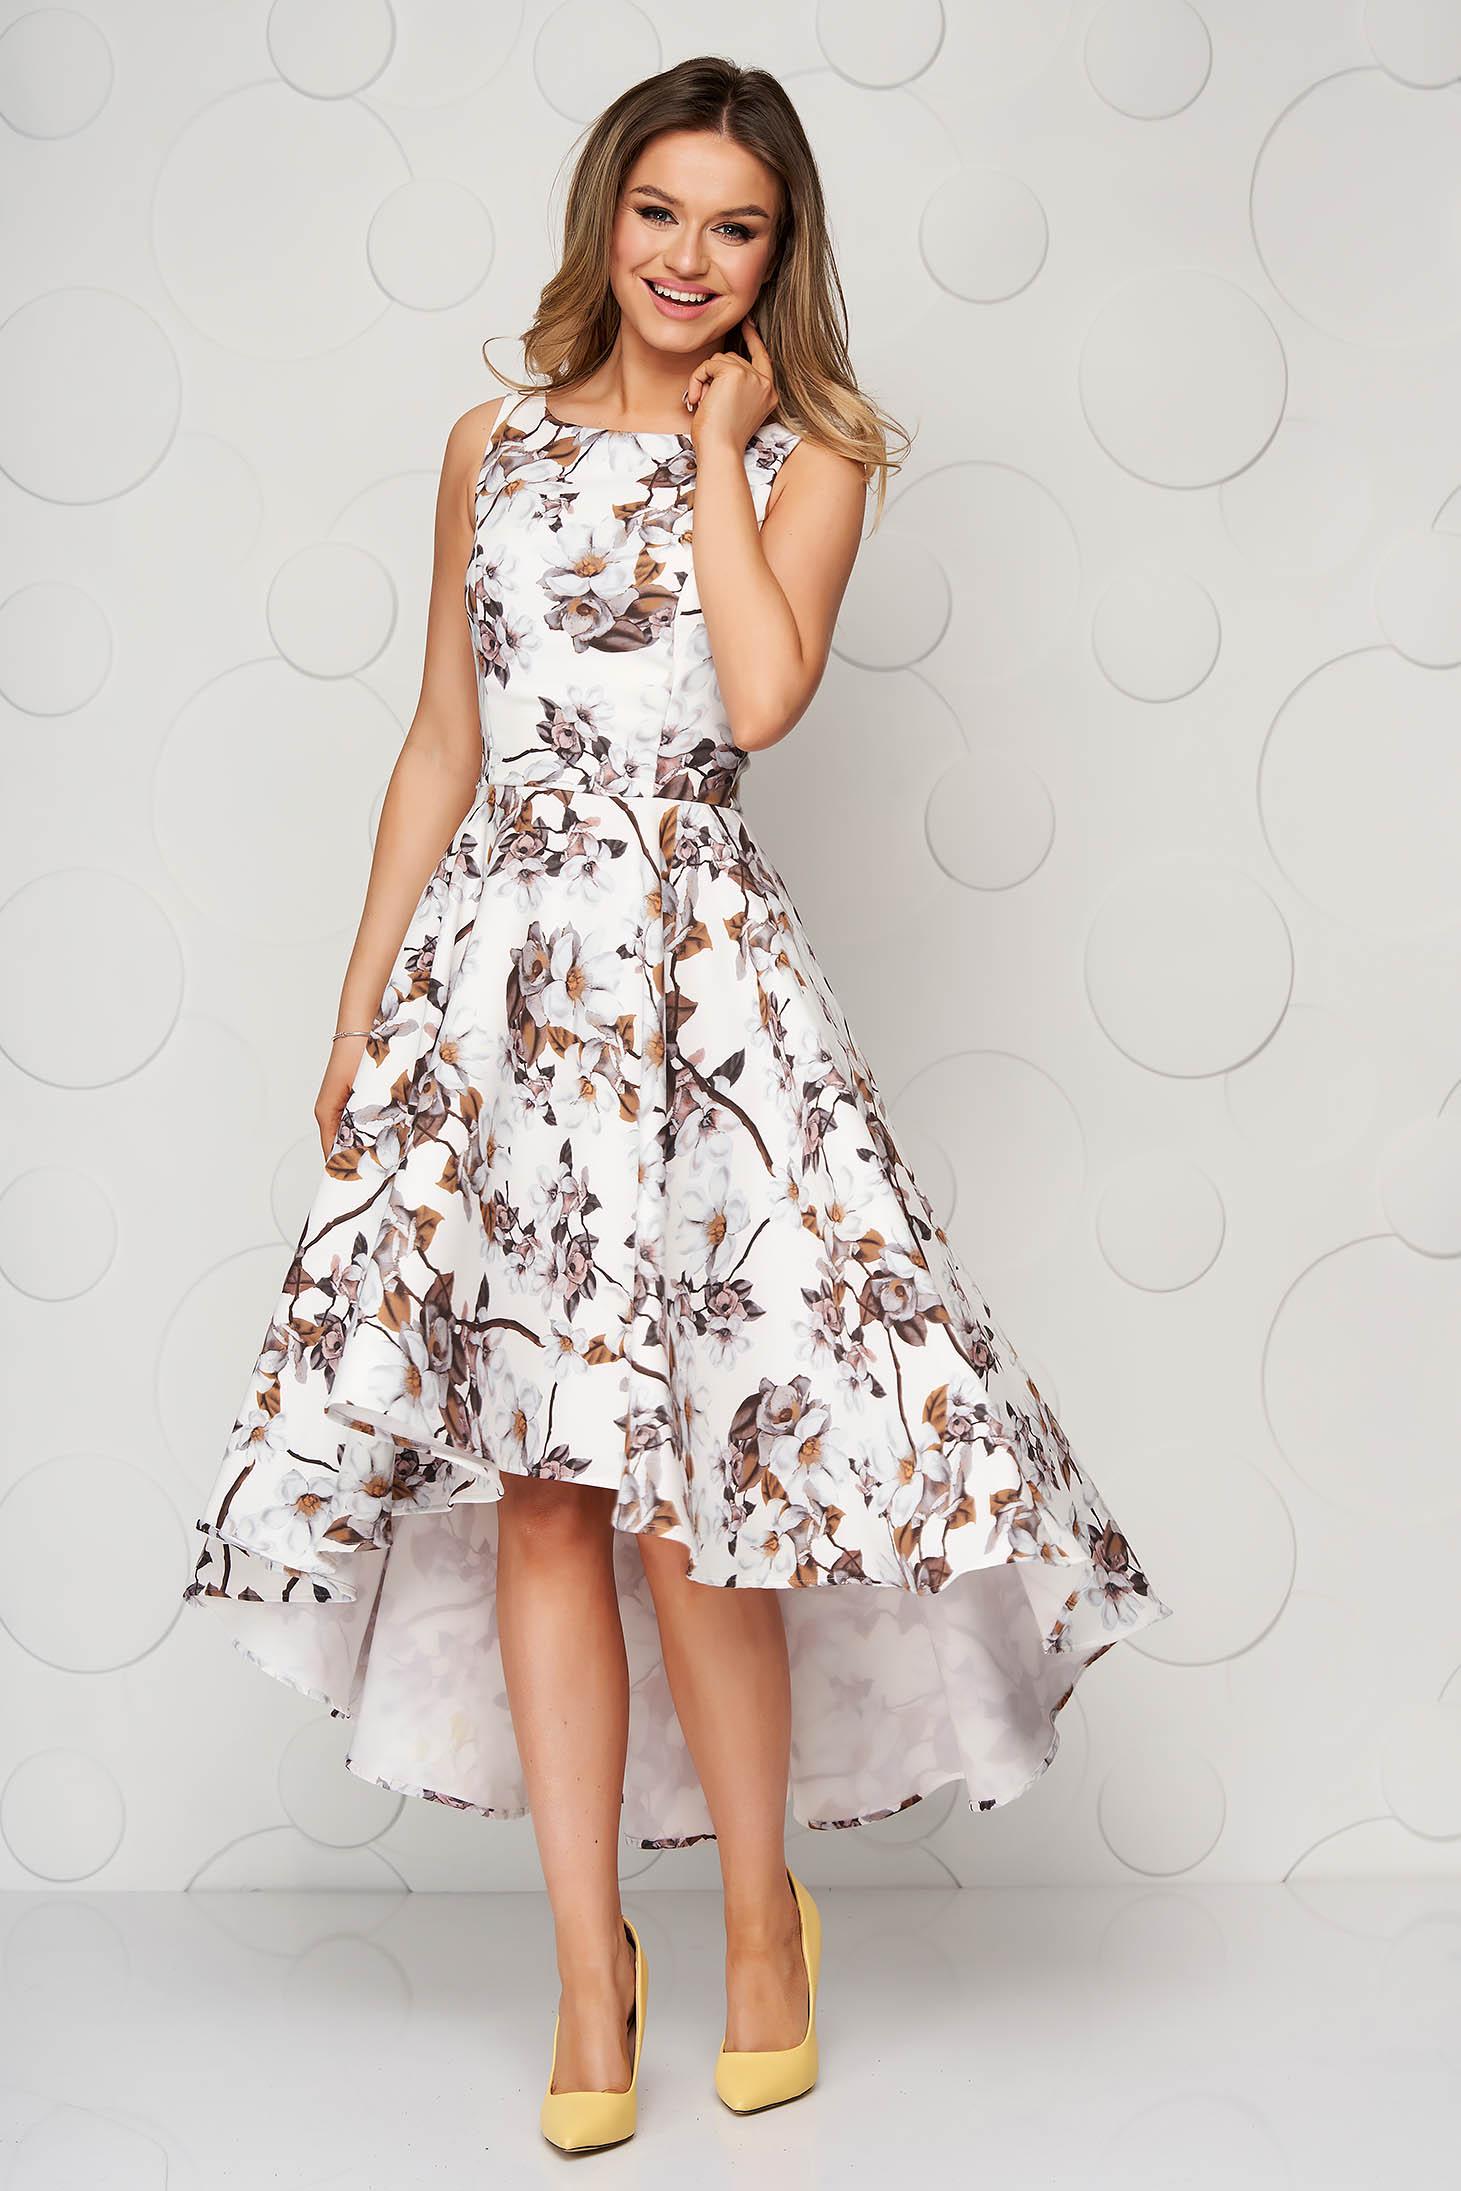 Dress StarShinerS ivory cloth elegant asymmetrical cloche from elastic fabric